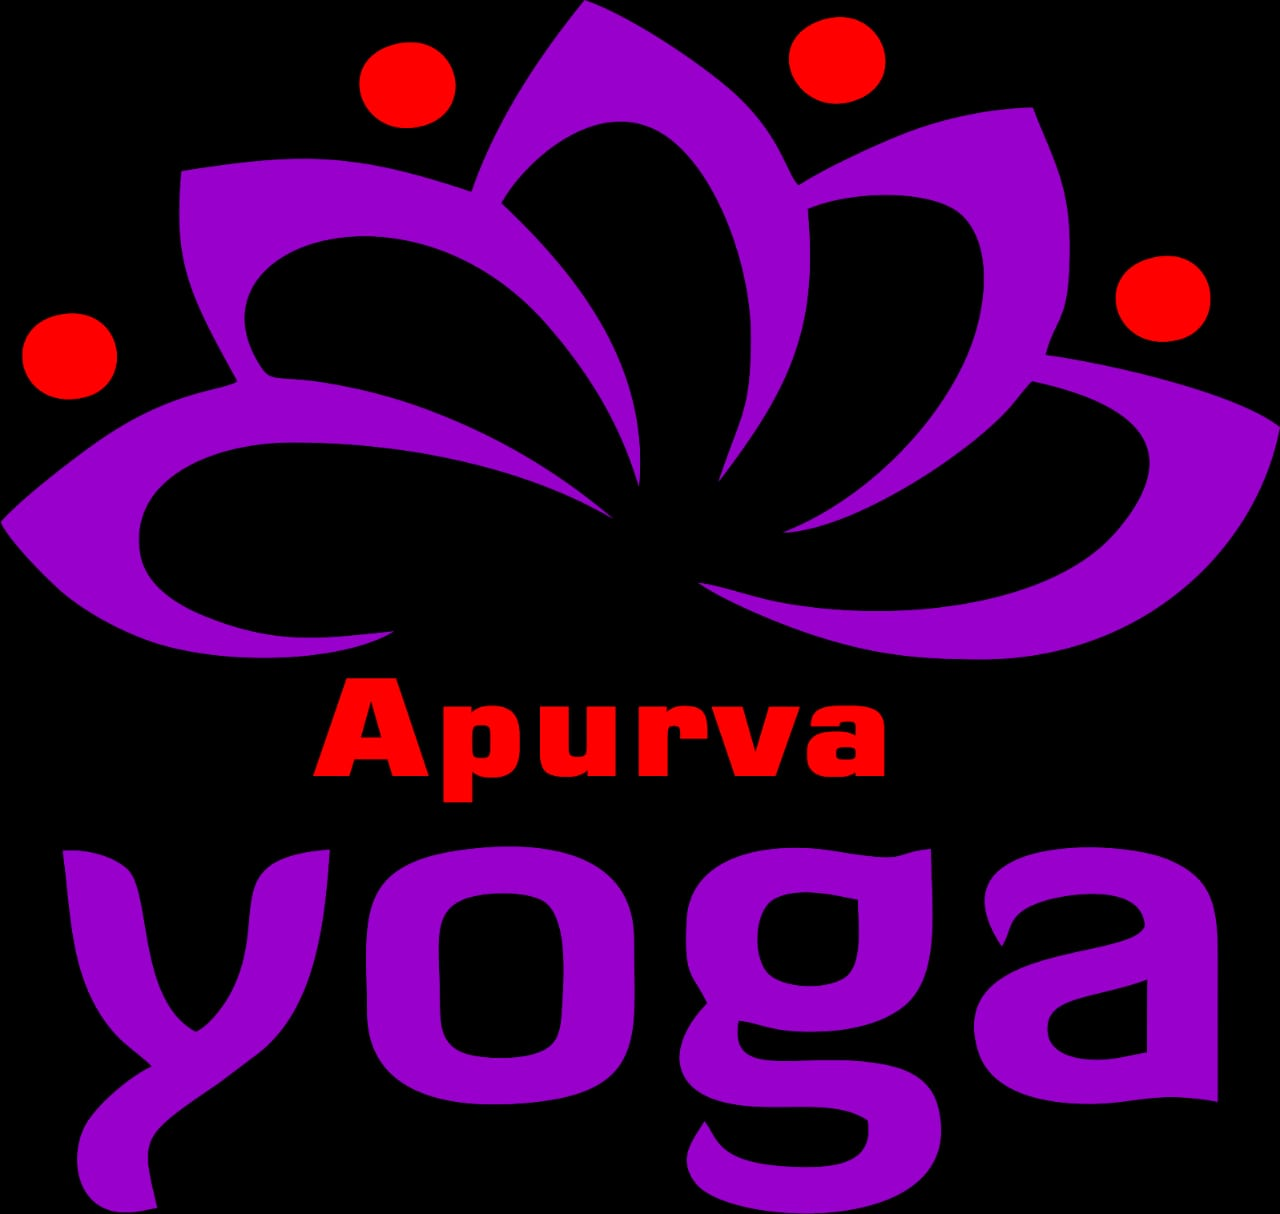 Apurva Yoga Ramamurthy Nagar